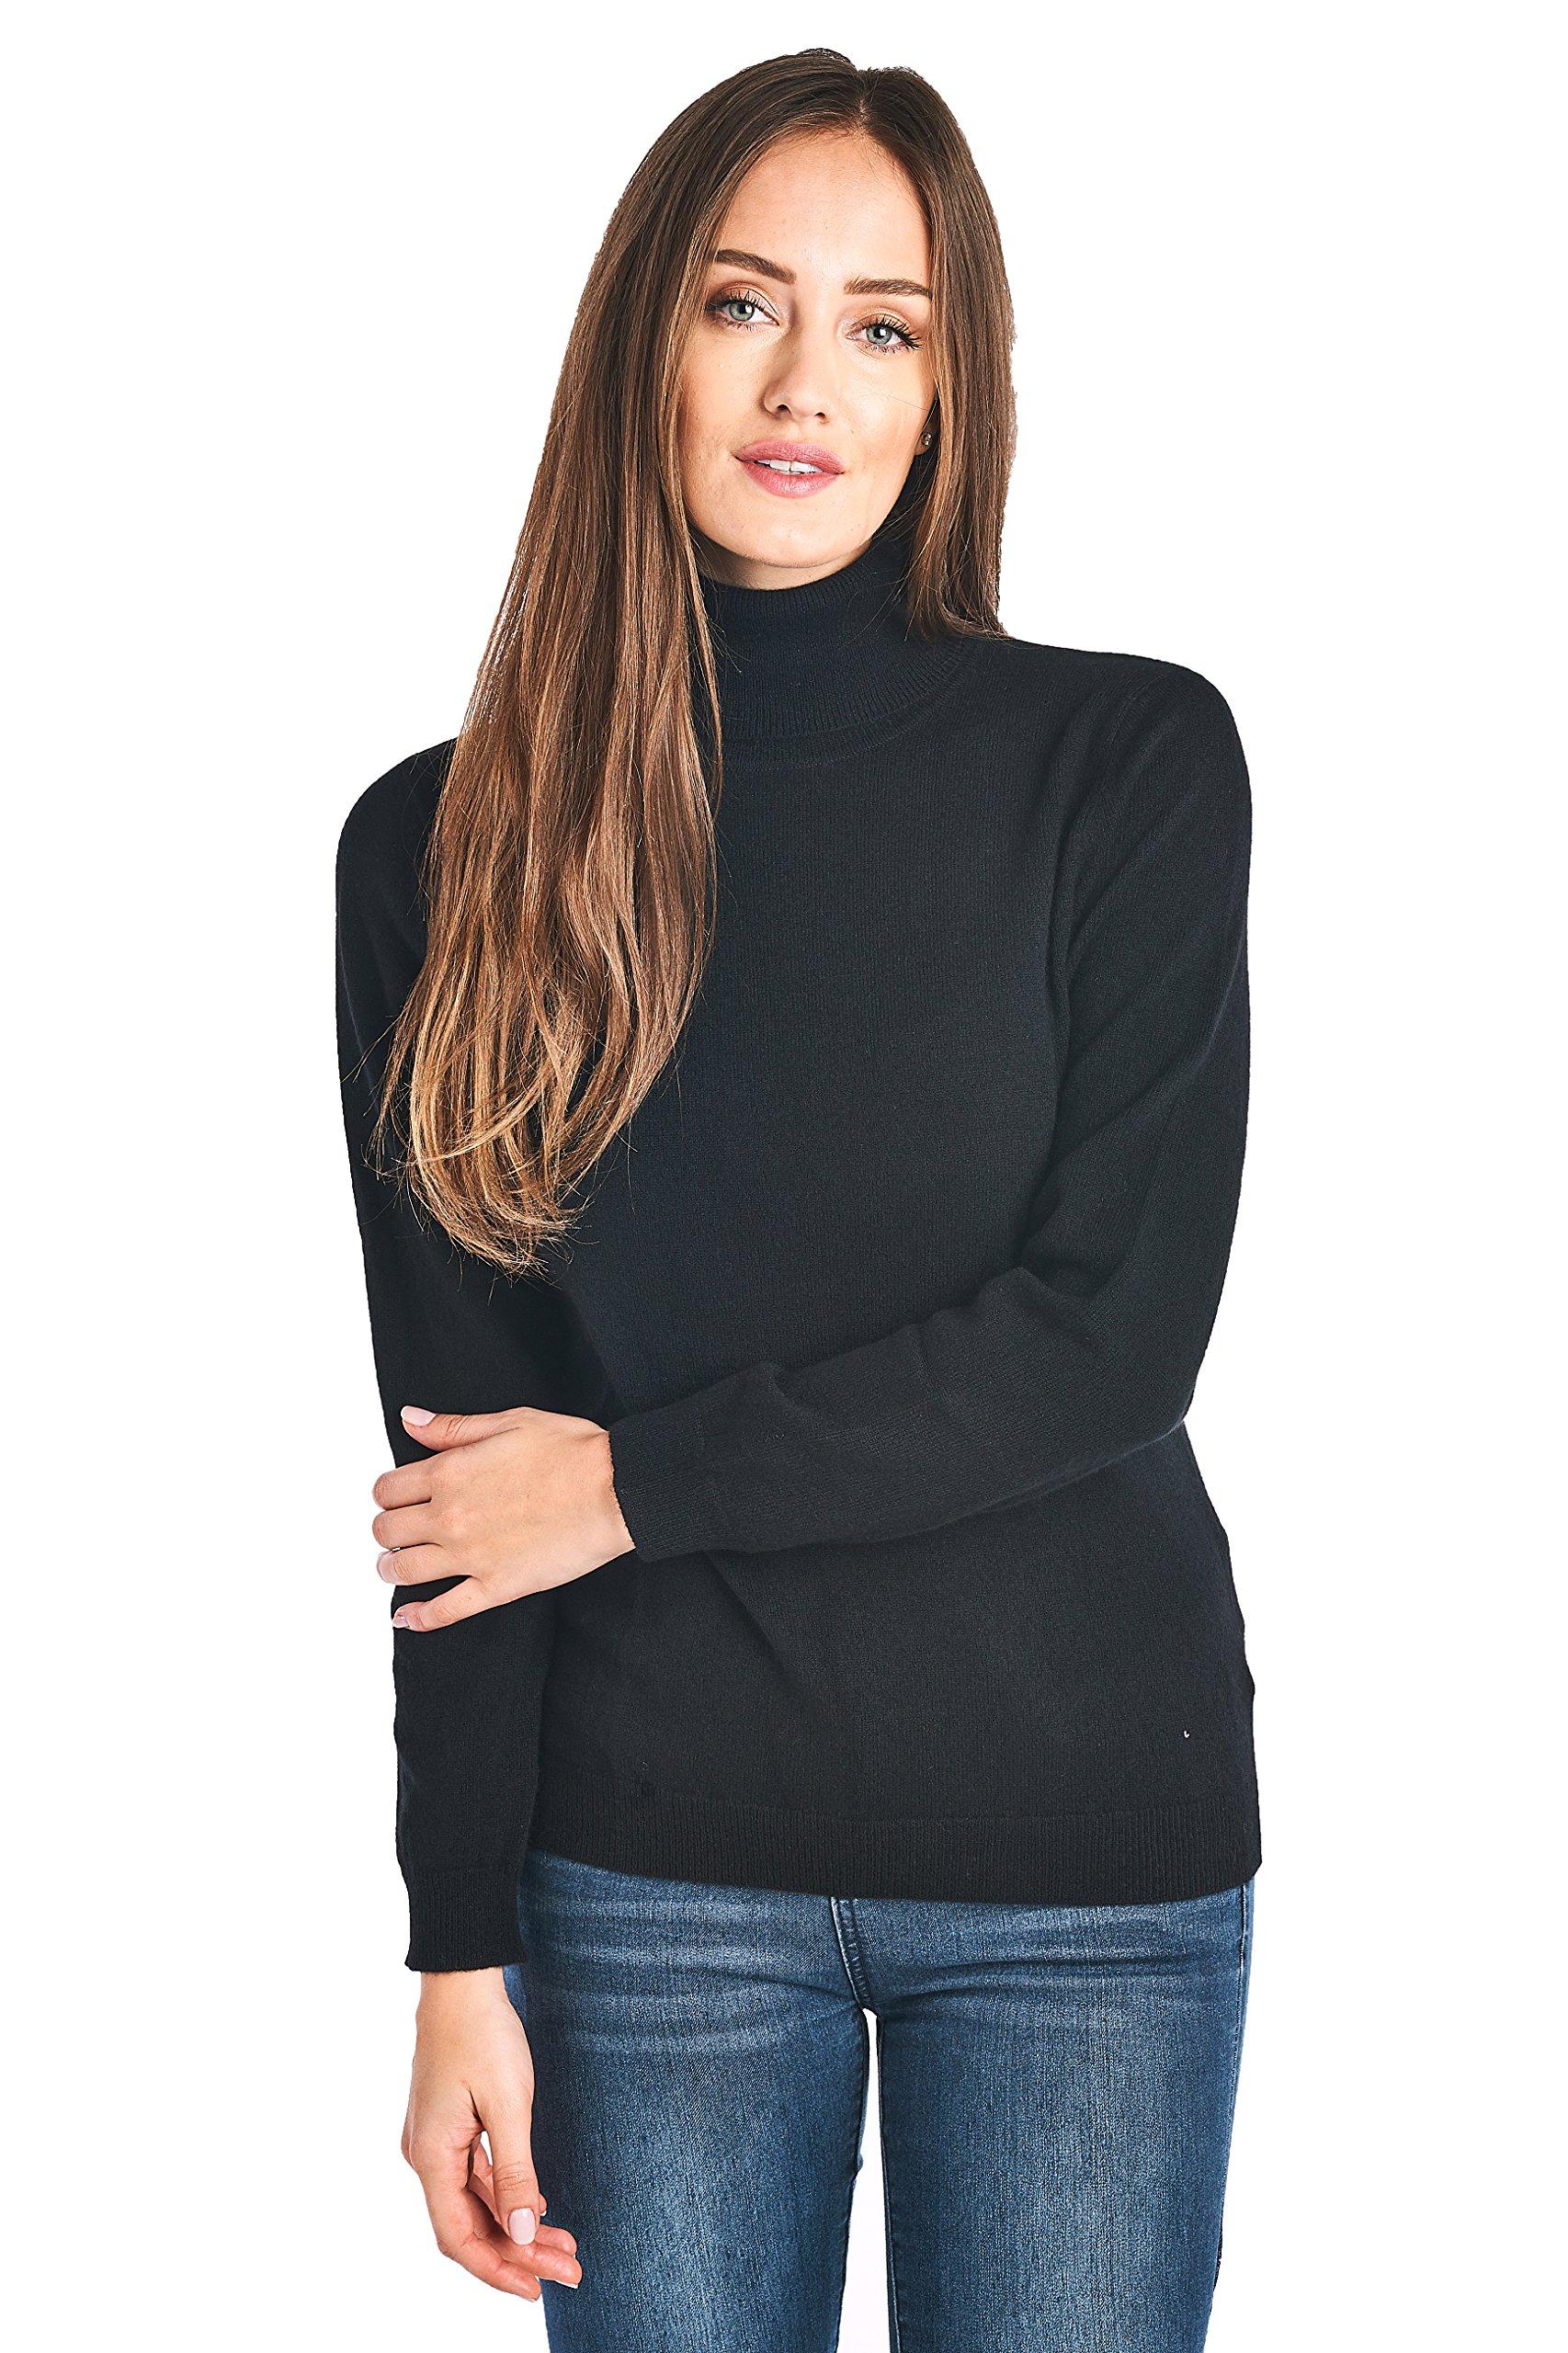 High Style Women's 100% Cashmere Long Sleeve Turtleneck Sweater (1303, Black, S)